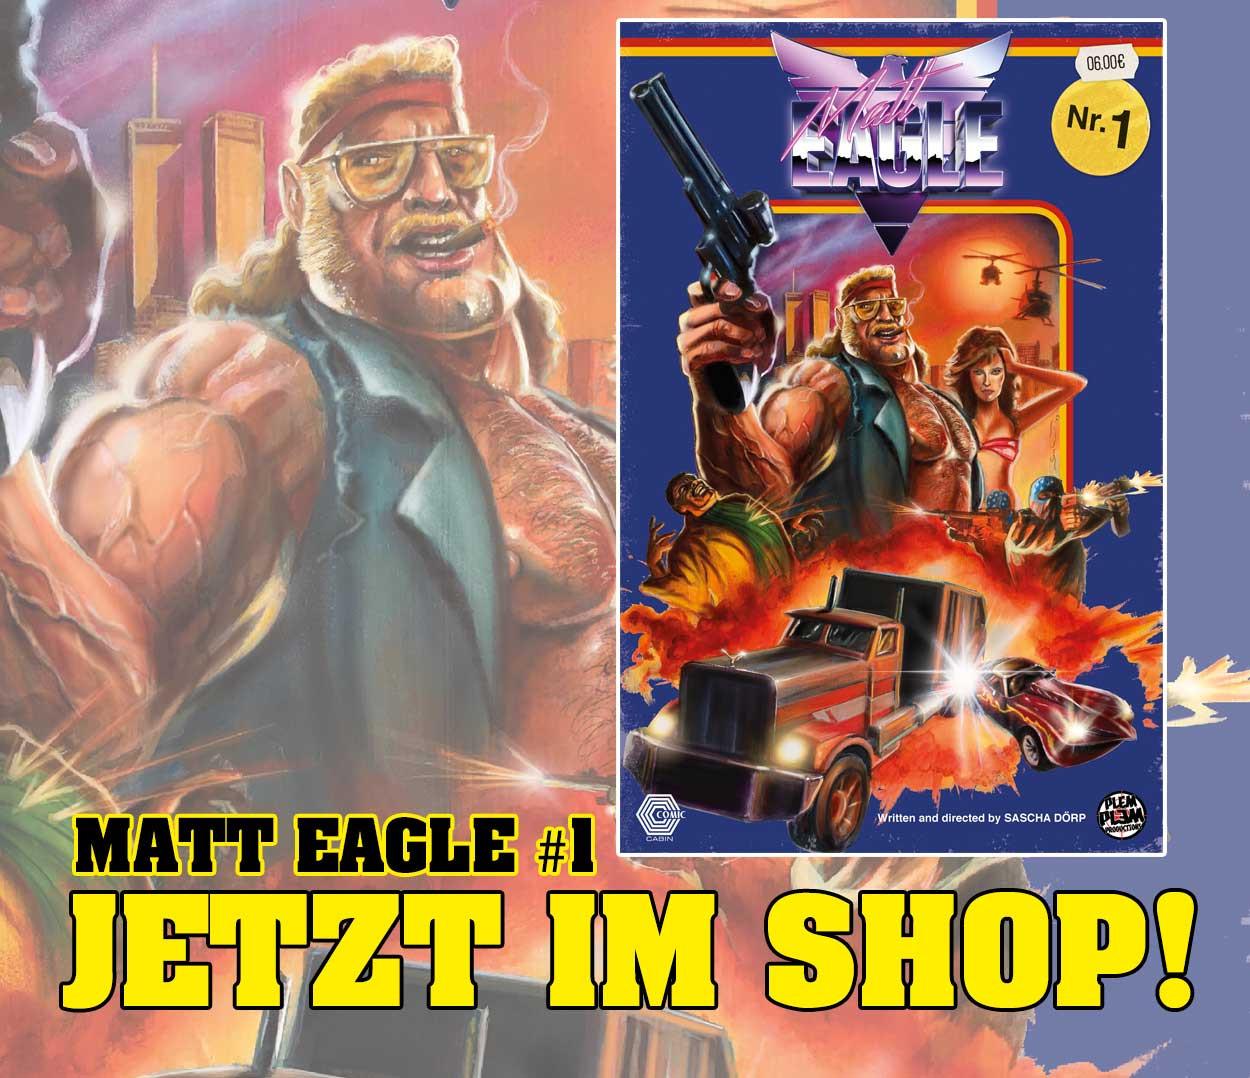 Matt Eagle #1